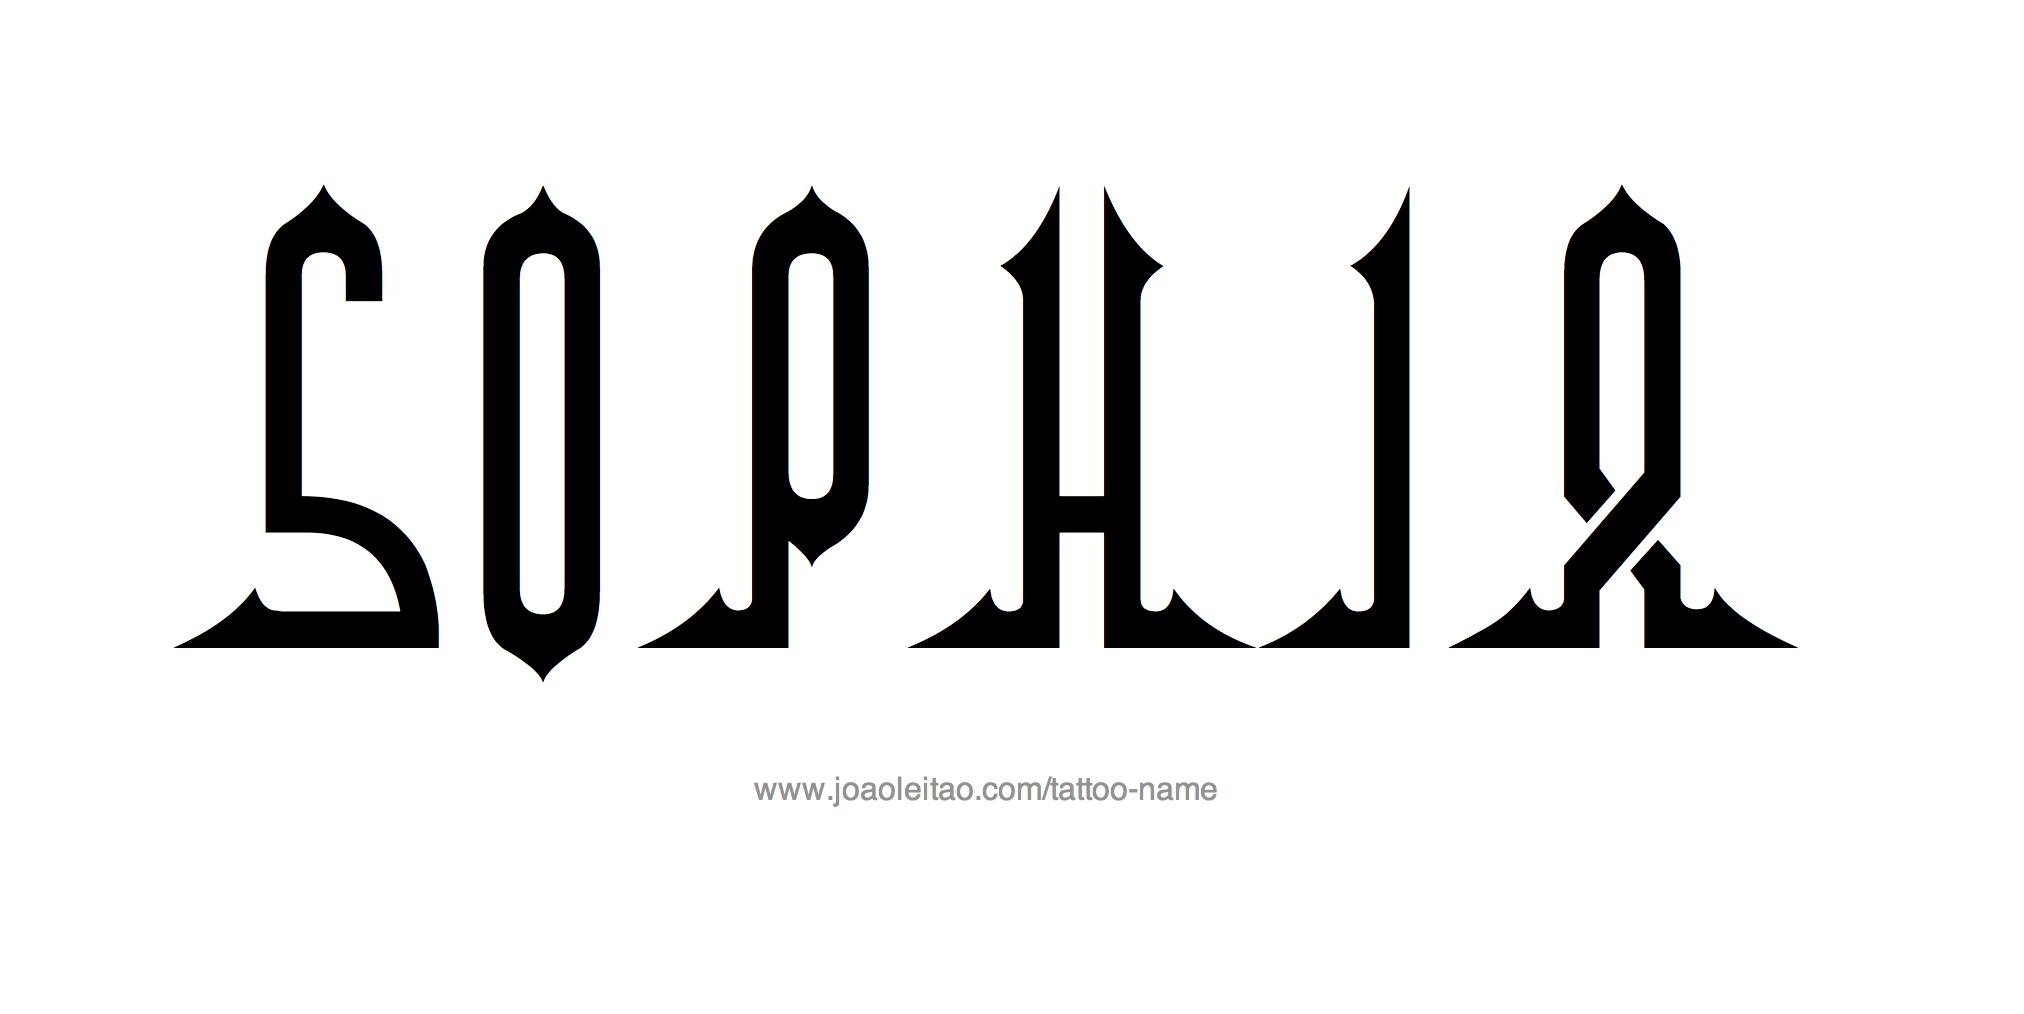 sophia word images reverse search. Black Bedroom Furniture Sets. Home Design Ideas